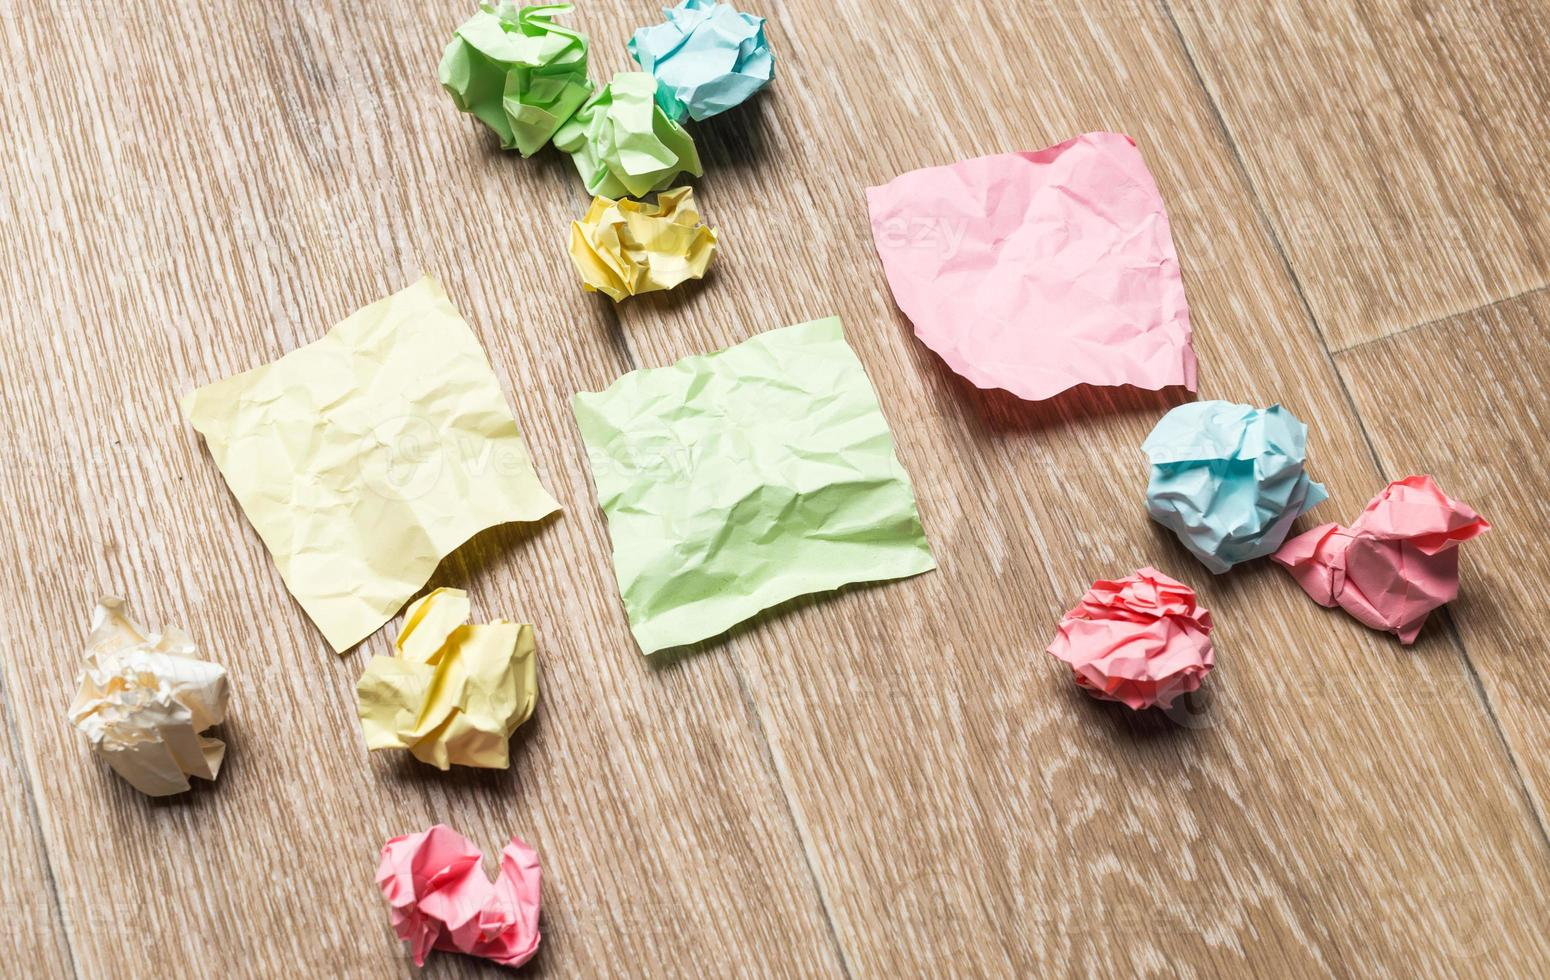 zerknitterte Papierbündel mit leerem Papier foto